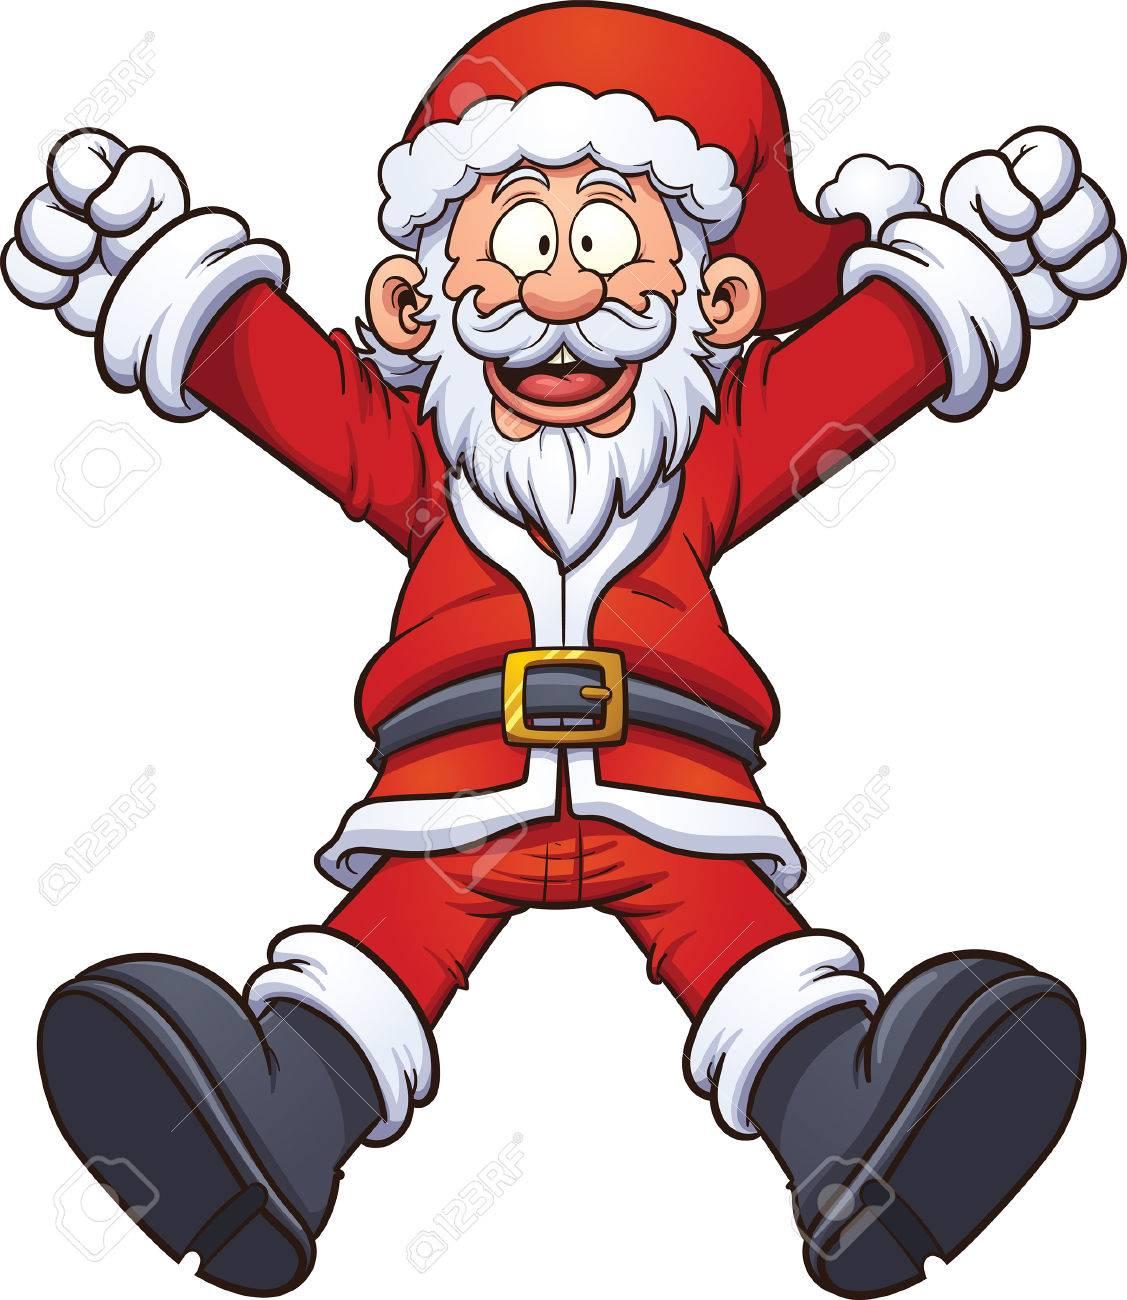 92,825 Santa Claus Stock Vector Illustration And Royalty Free ...